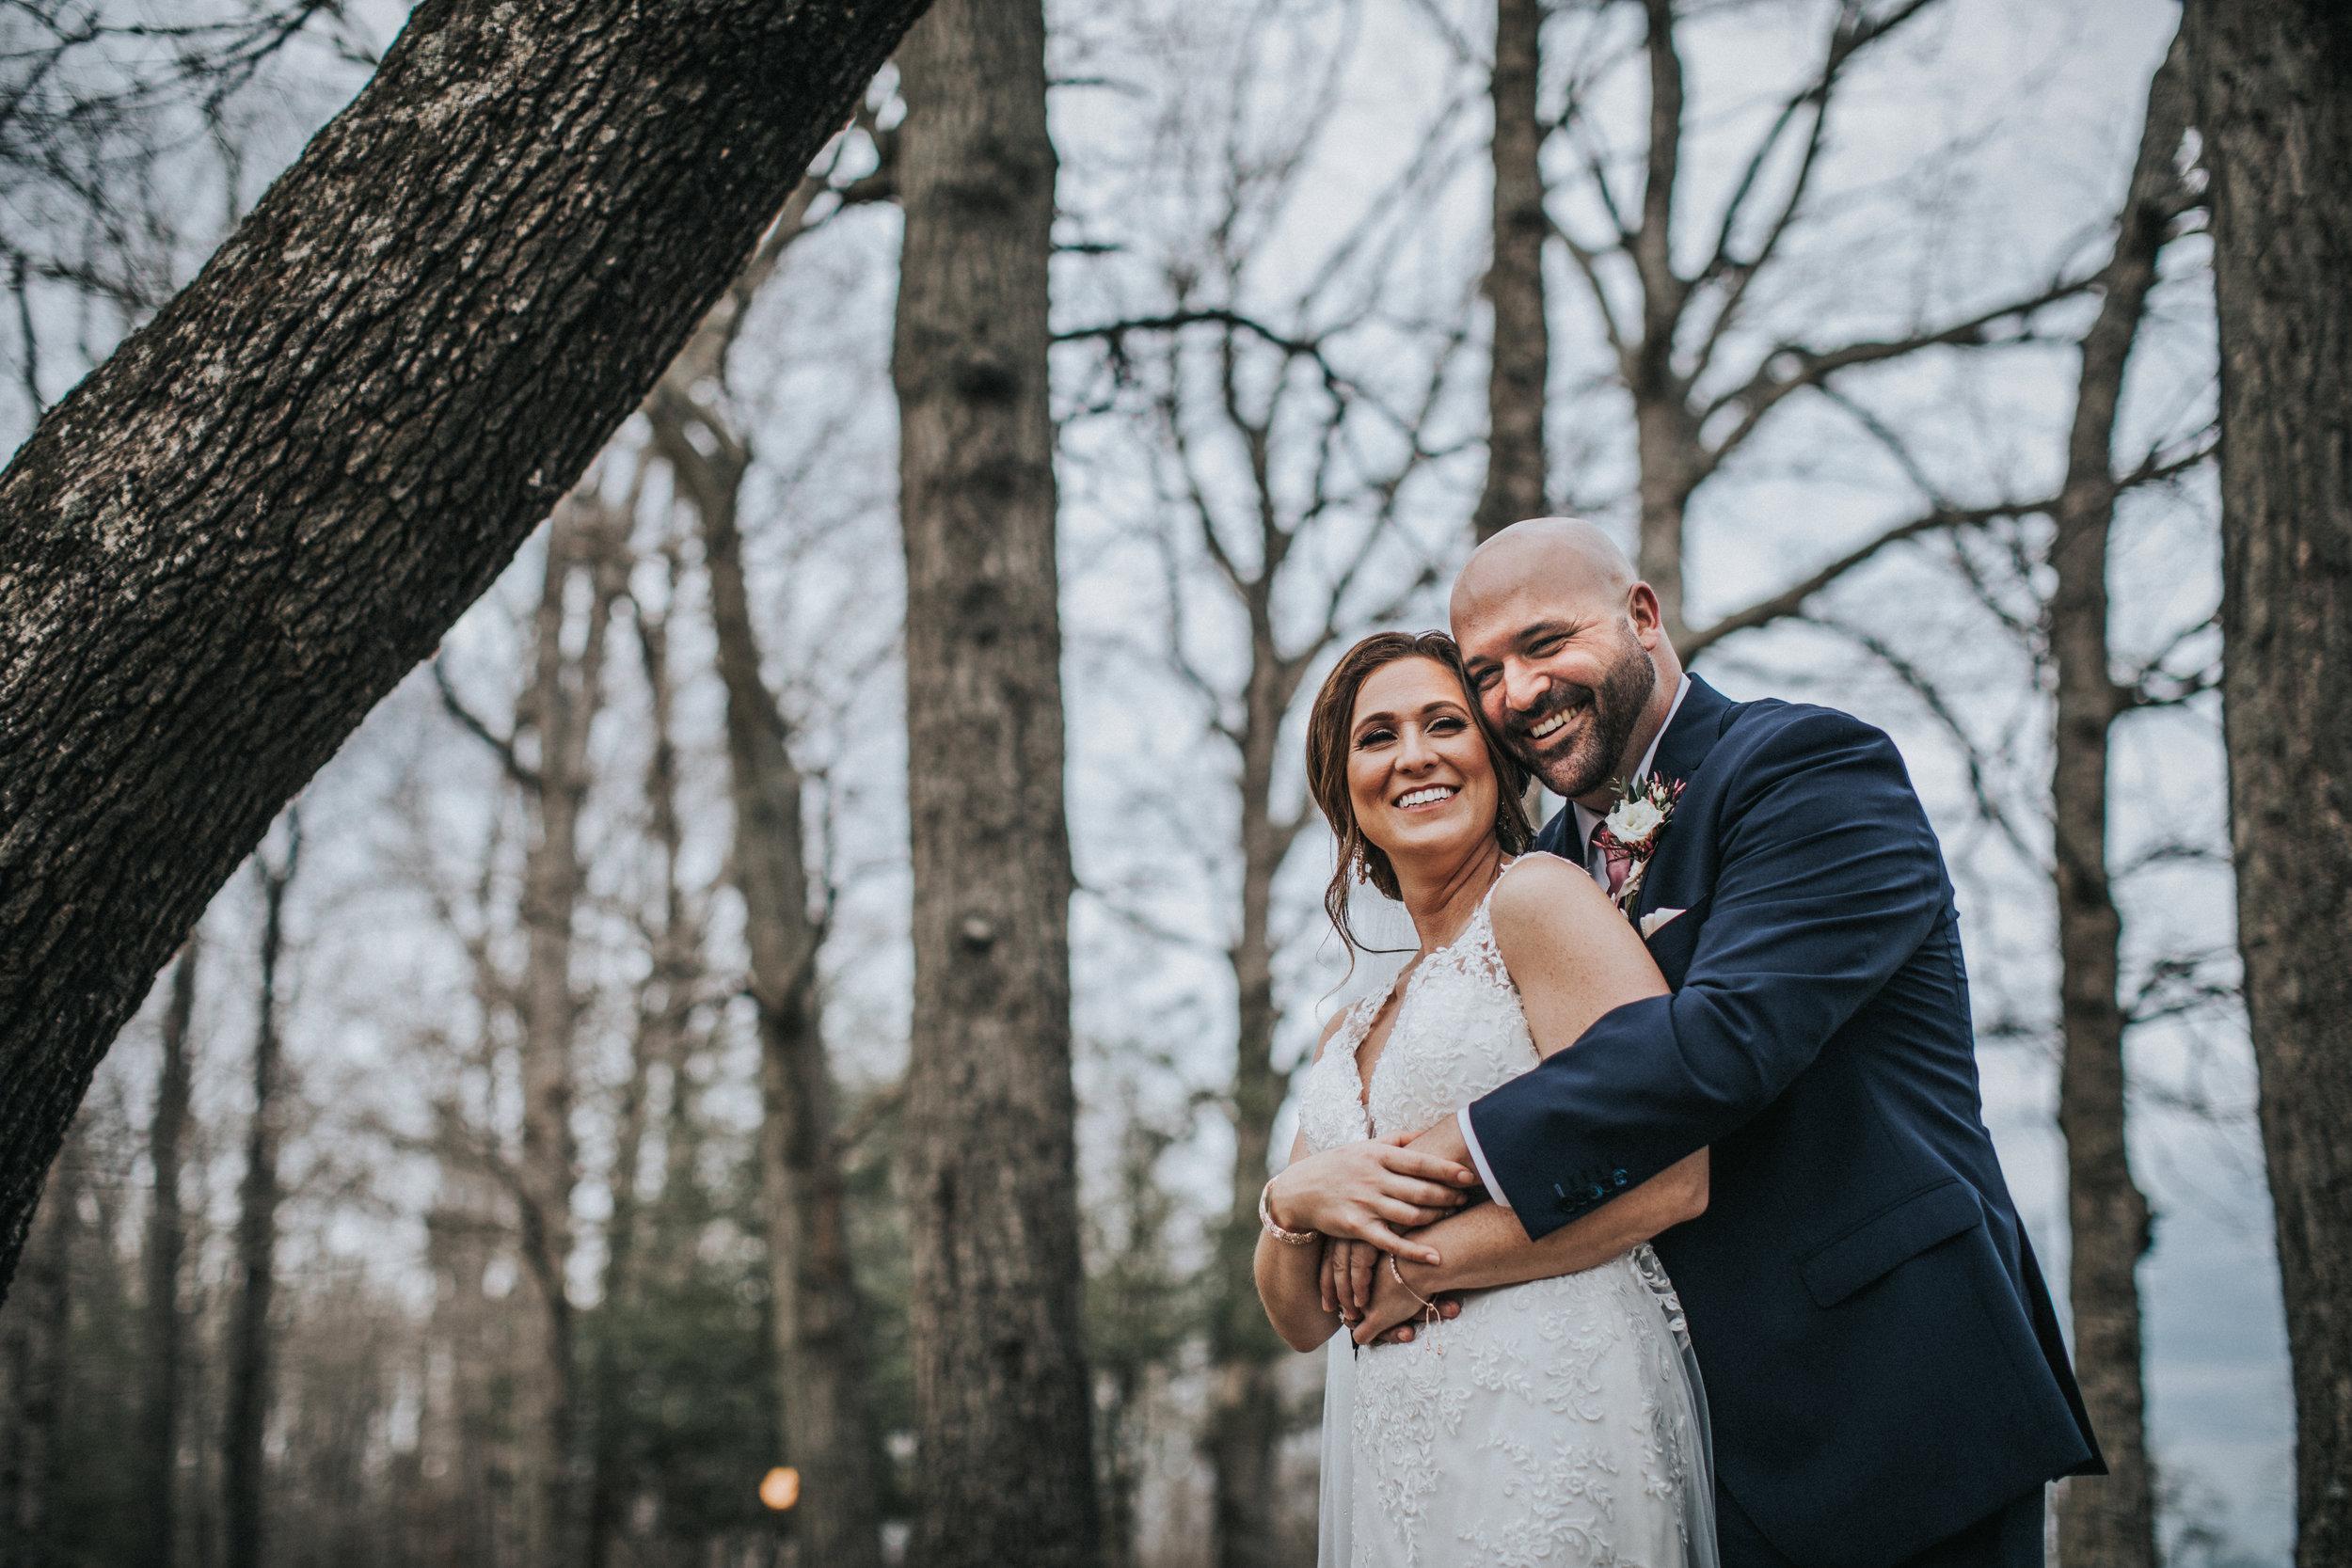 New-Jersey-Wedding-Photographer-JennaLynnPhotography-Grove-at-Centerton-Wedding-Cait&BobPreview-3.jpg